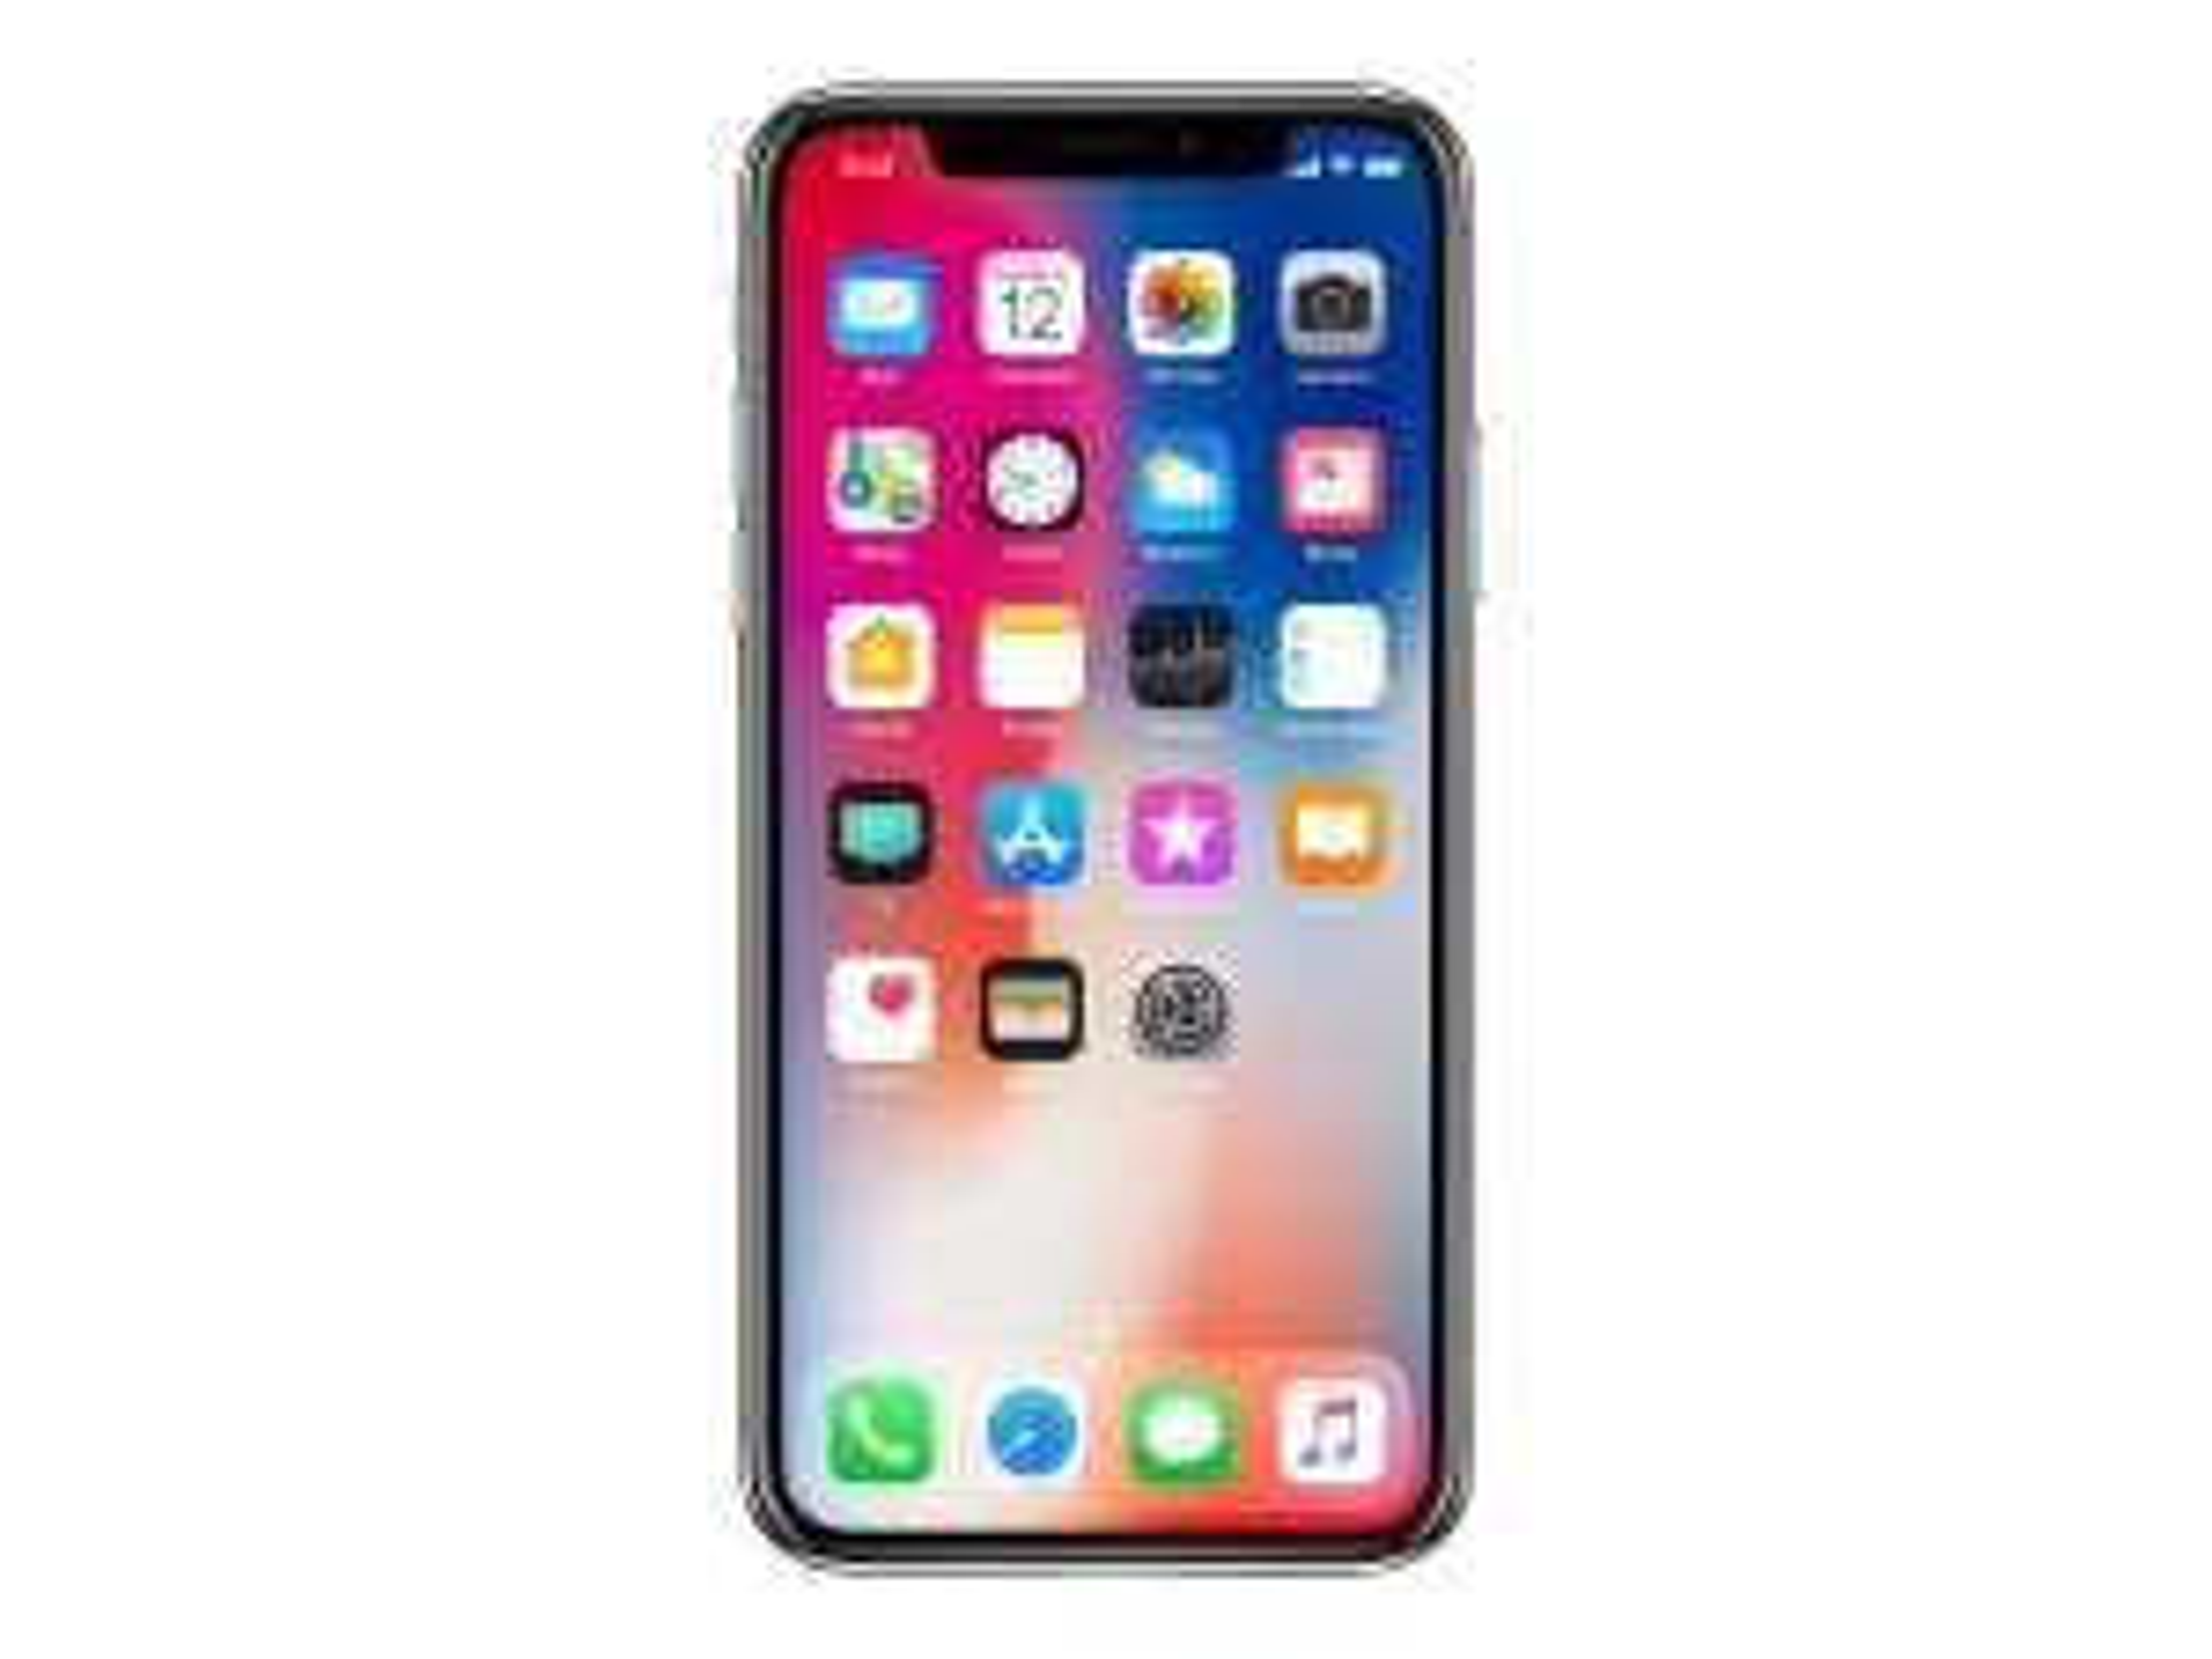 [www.bold-kiwi.com] iPhone X Silber 64 GB für € 944,30 inkl. Transport (Paypal Zahlung möglich)